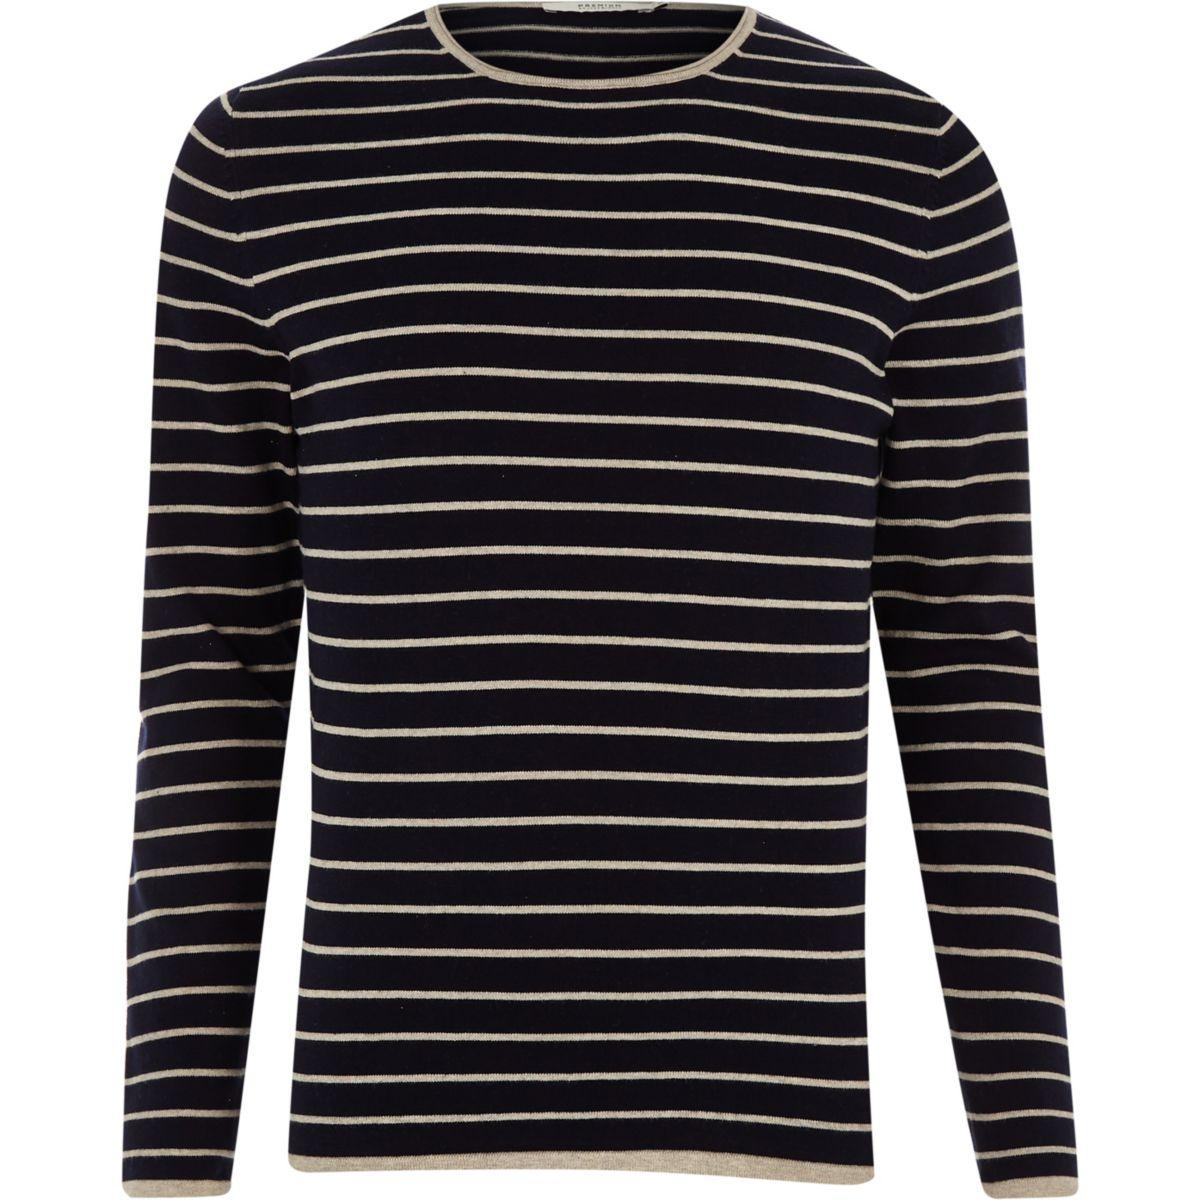 Jack & Jones navy knit stripe jumper